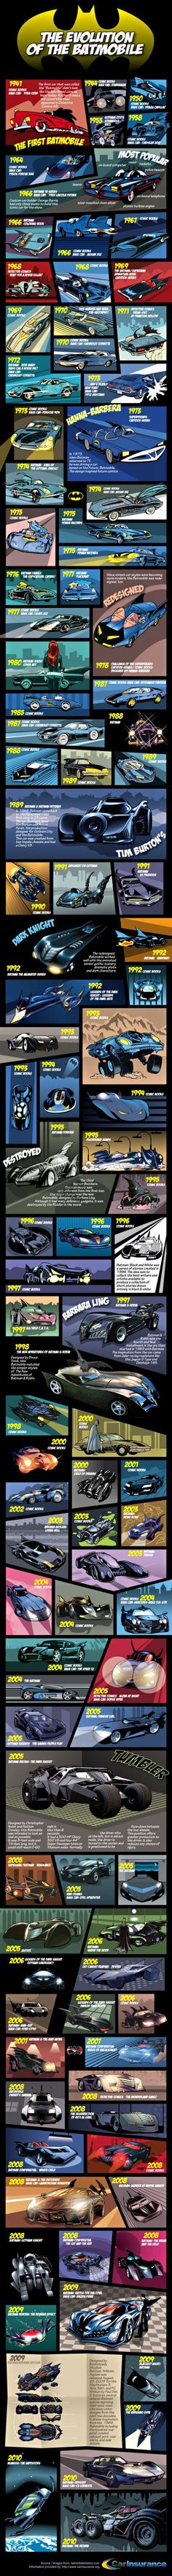 Evolution of The Batmobile...